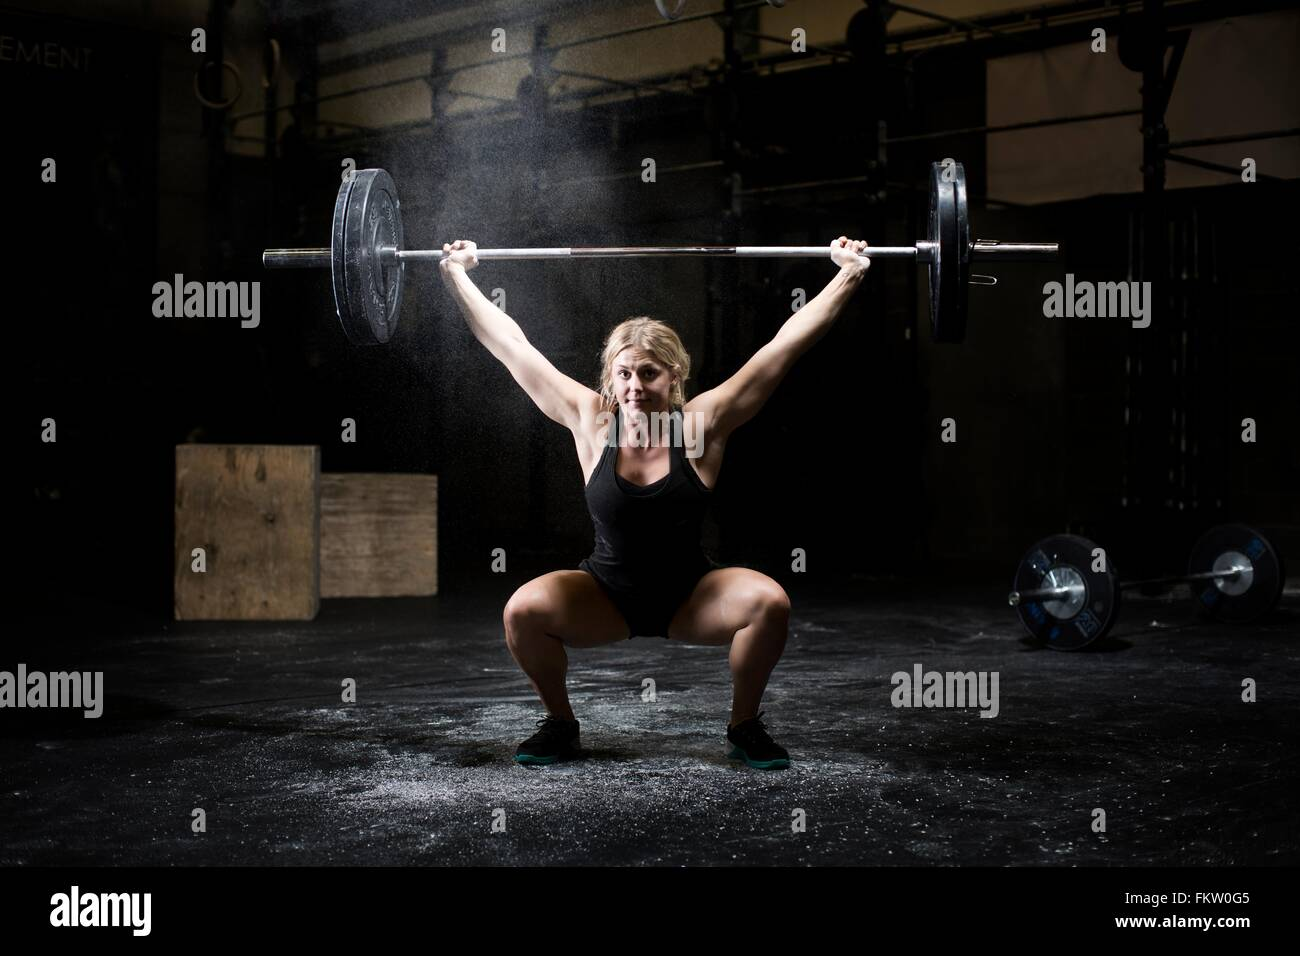 Mujer joven halterofilia barbell en gimnasio oscuro Imagen De Stock